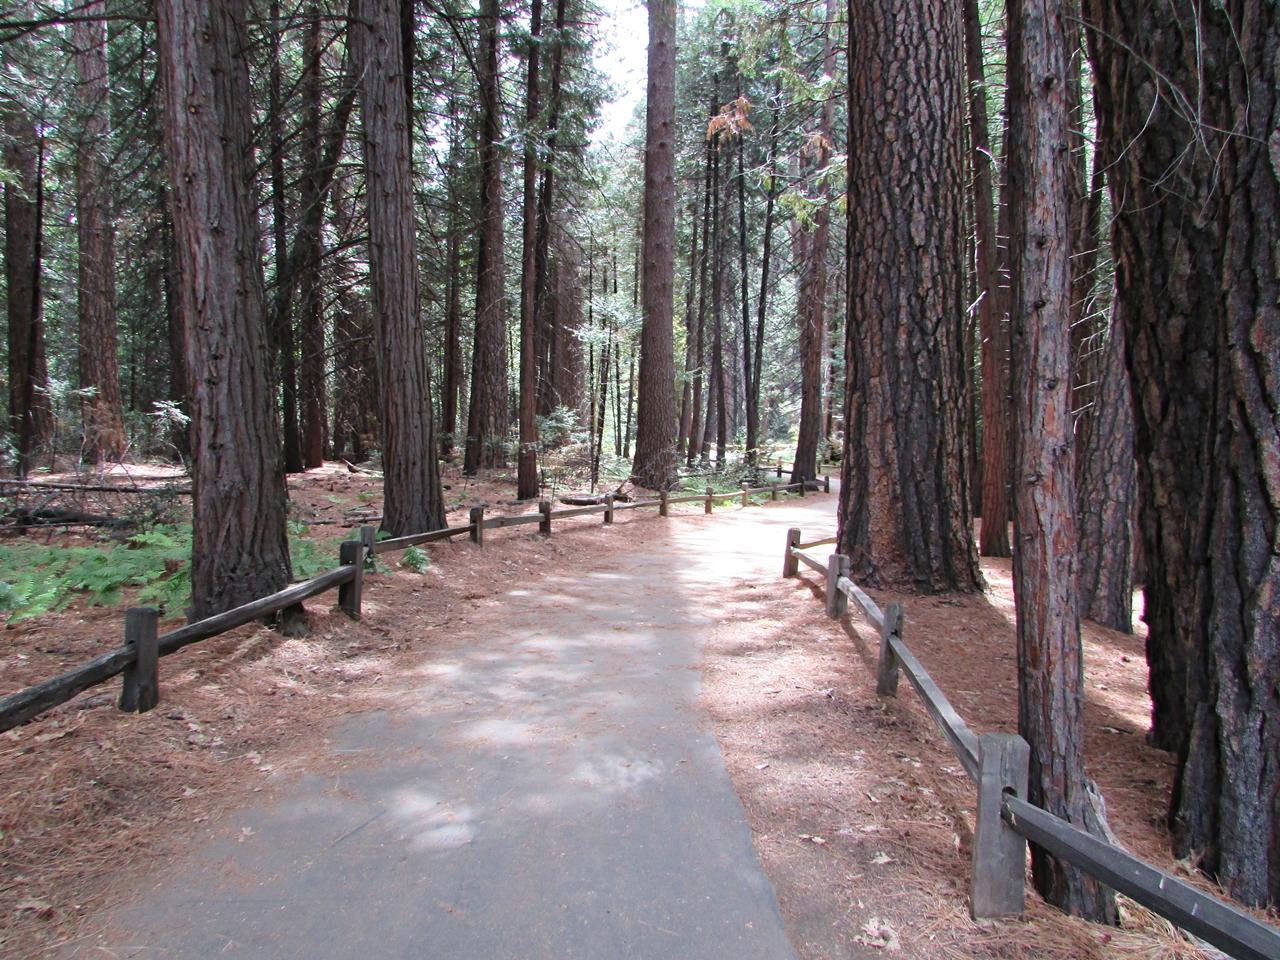 USA Rundreise - Amerika Westküste - Yosemite Nationalpark - Fashionladyloves